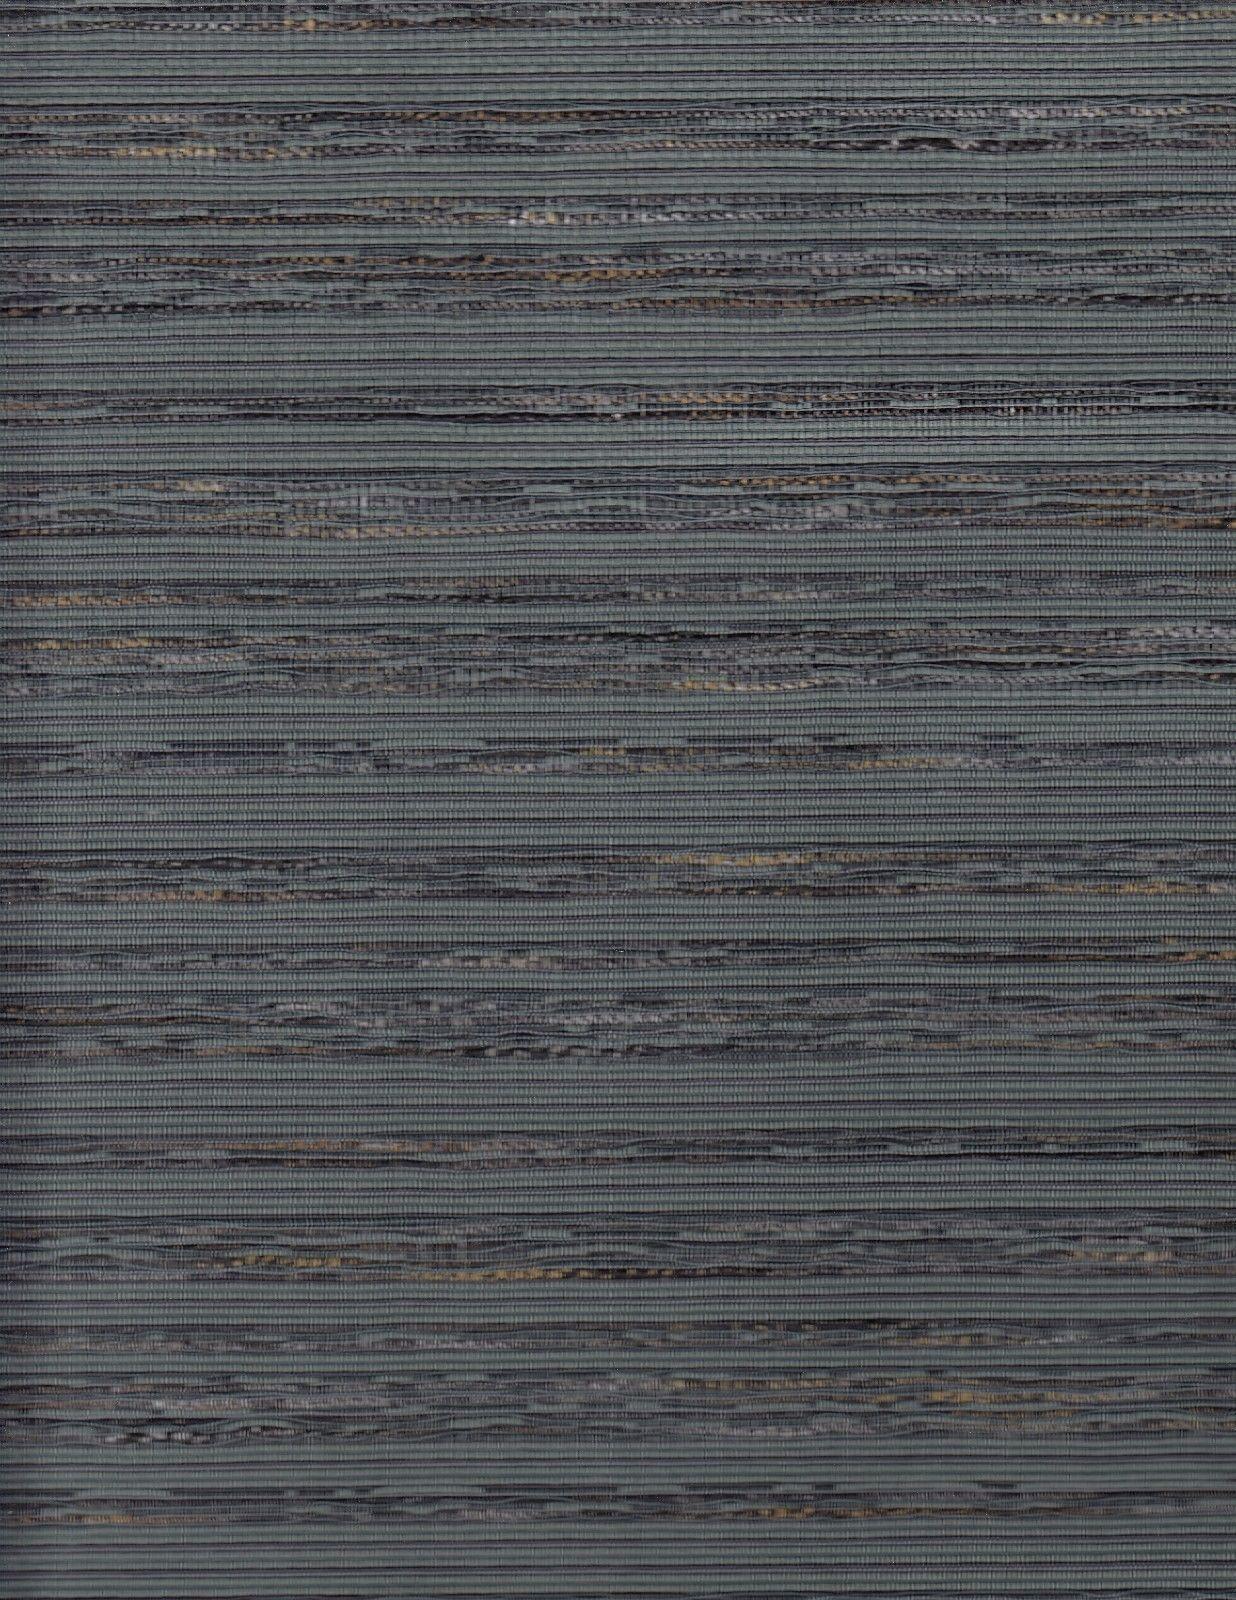 21yds Mid Century Modern Upholstery Fabric Ad Men Tweed Stripe Lake Blue ED1-c21